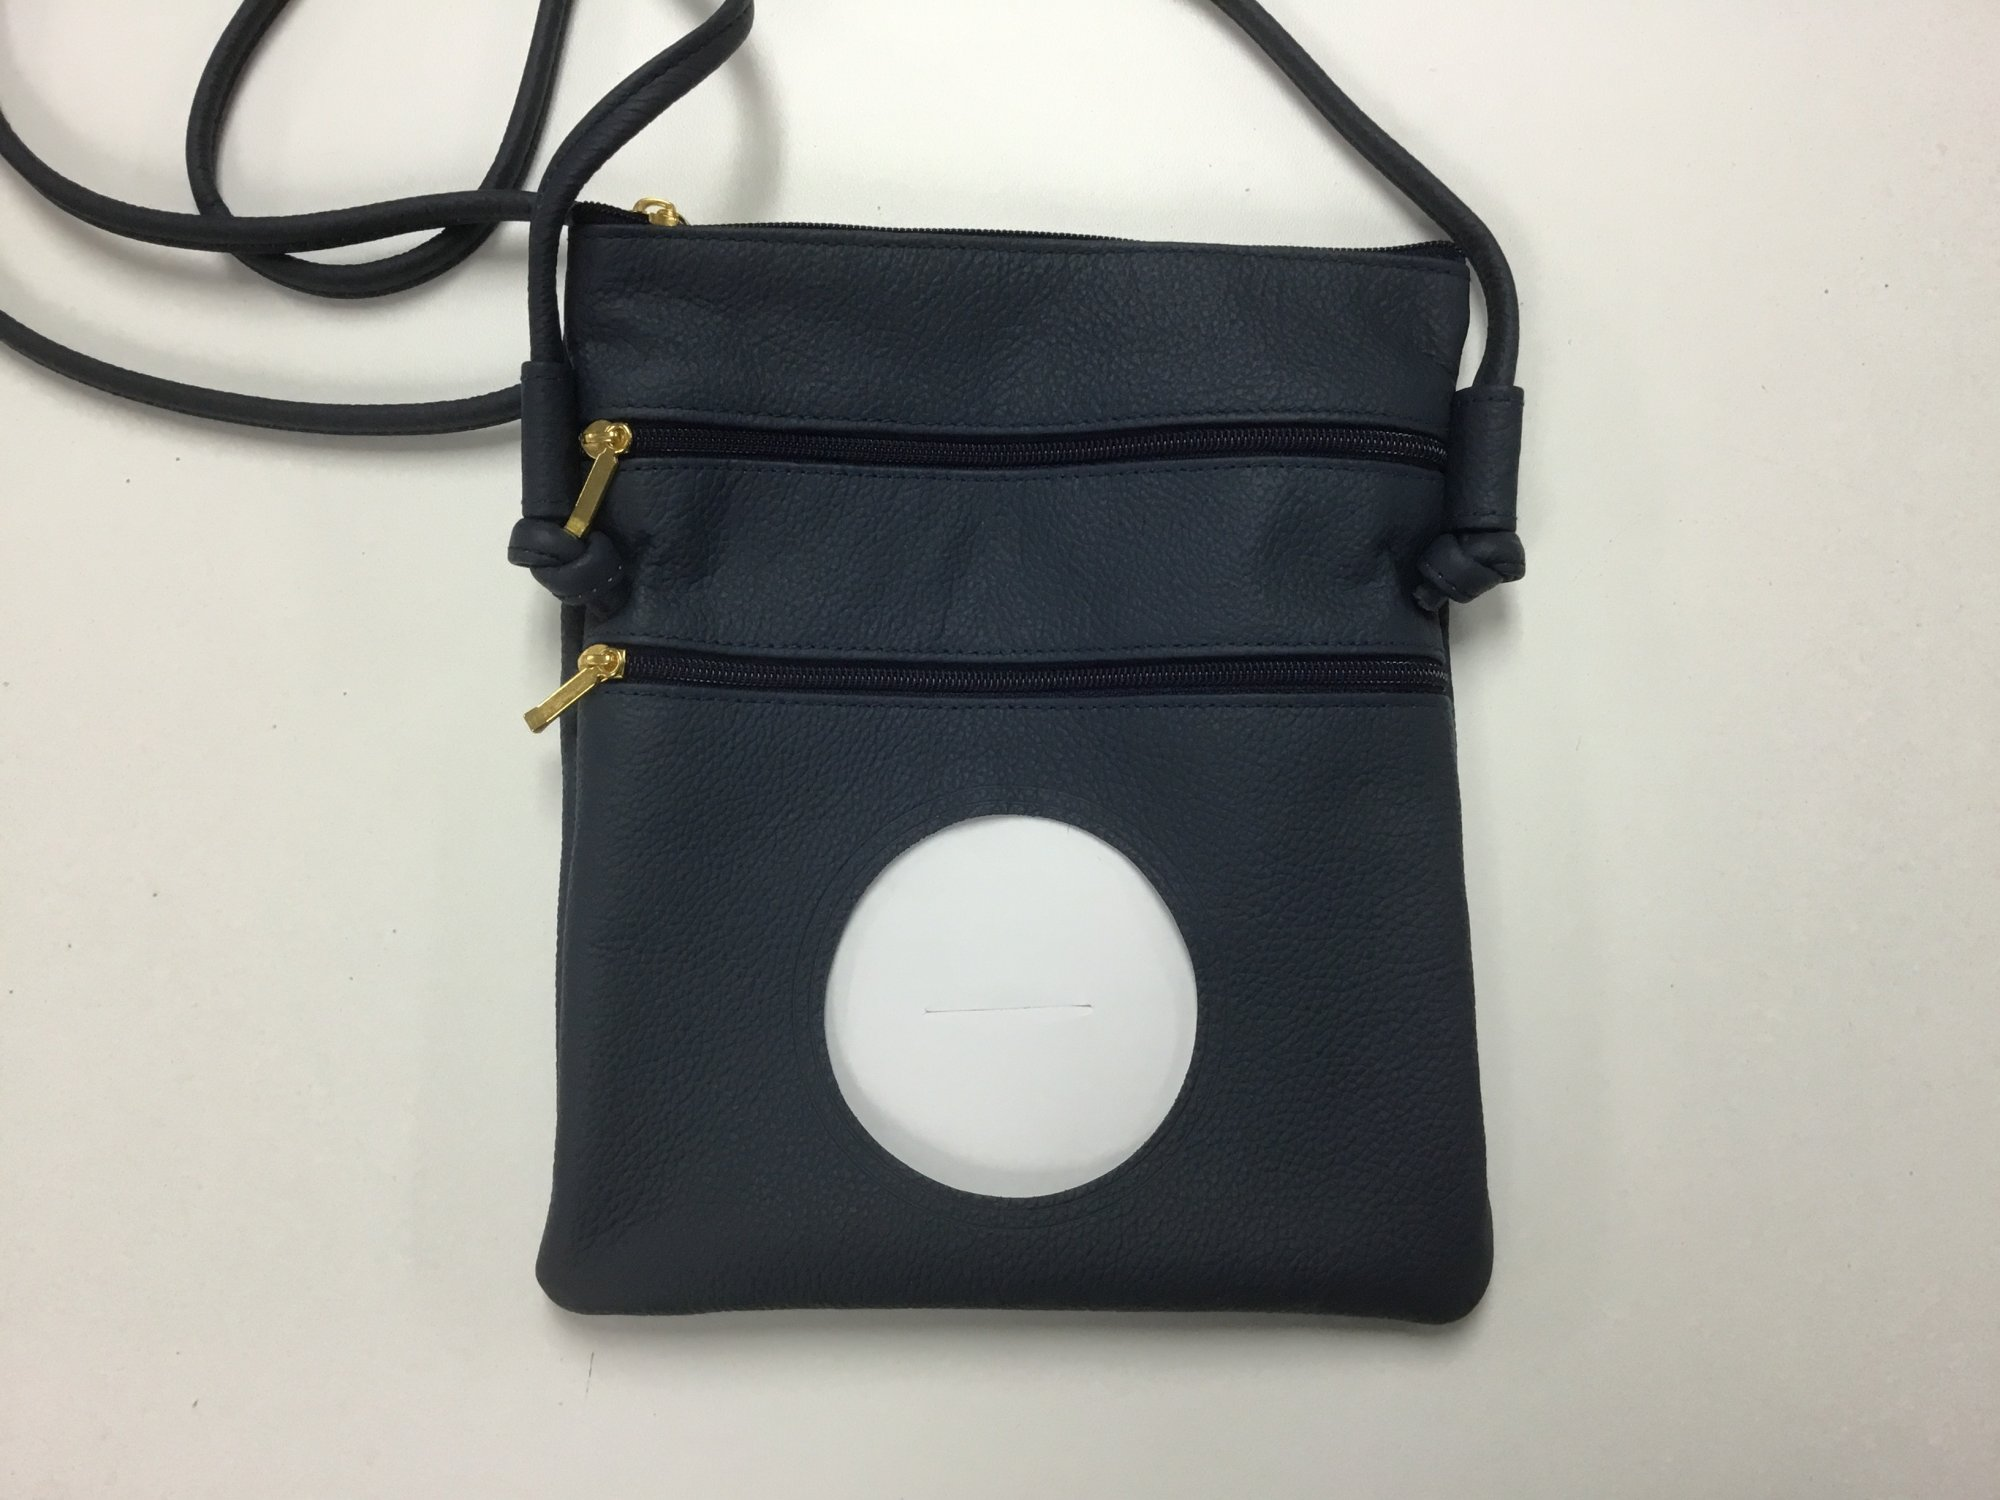 Crossbody Bag, Navy Leather, Self Finishing, 3 opening